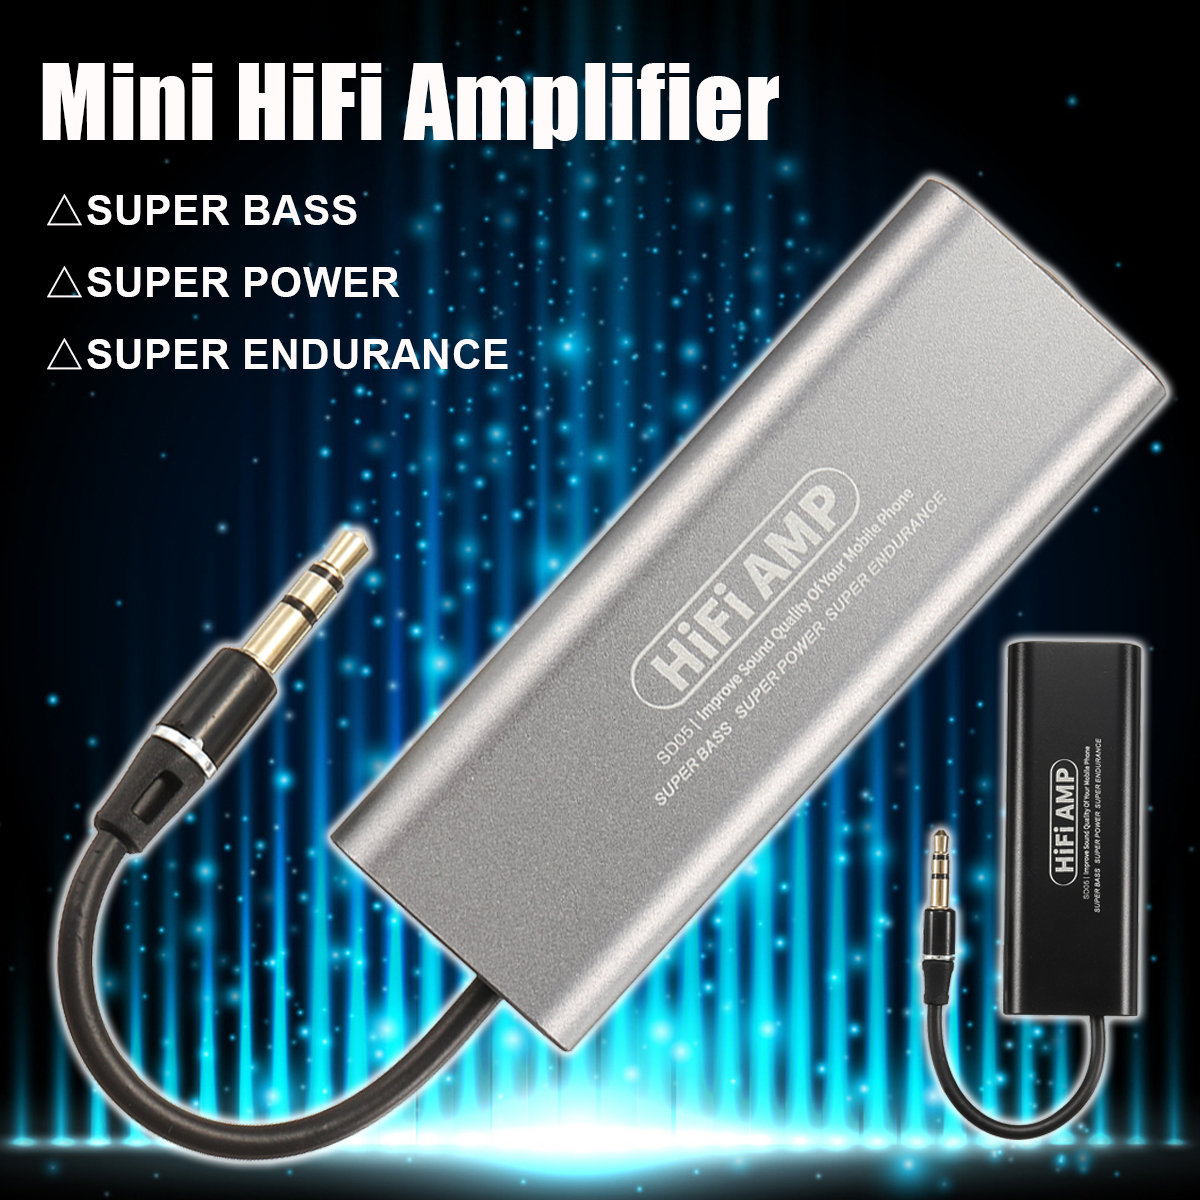 Unterhaltungselektronik Ggmm A1 Hifi Kopfhörer Verstärker Tragbare Digital Stereo Audio Amp Für Android Handys Mini Audio Verstärker Musik Player